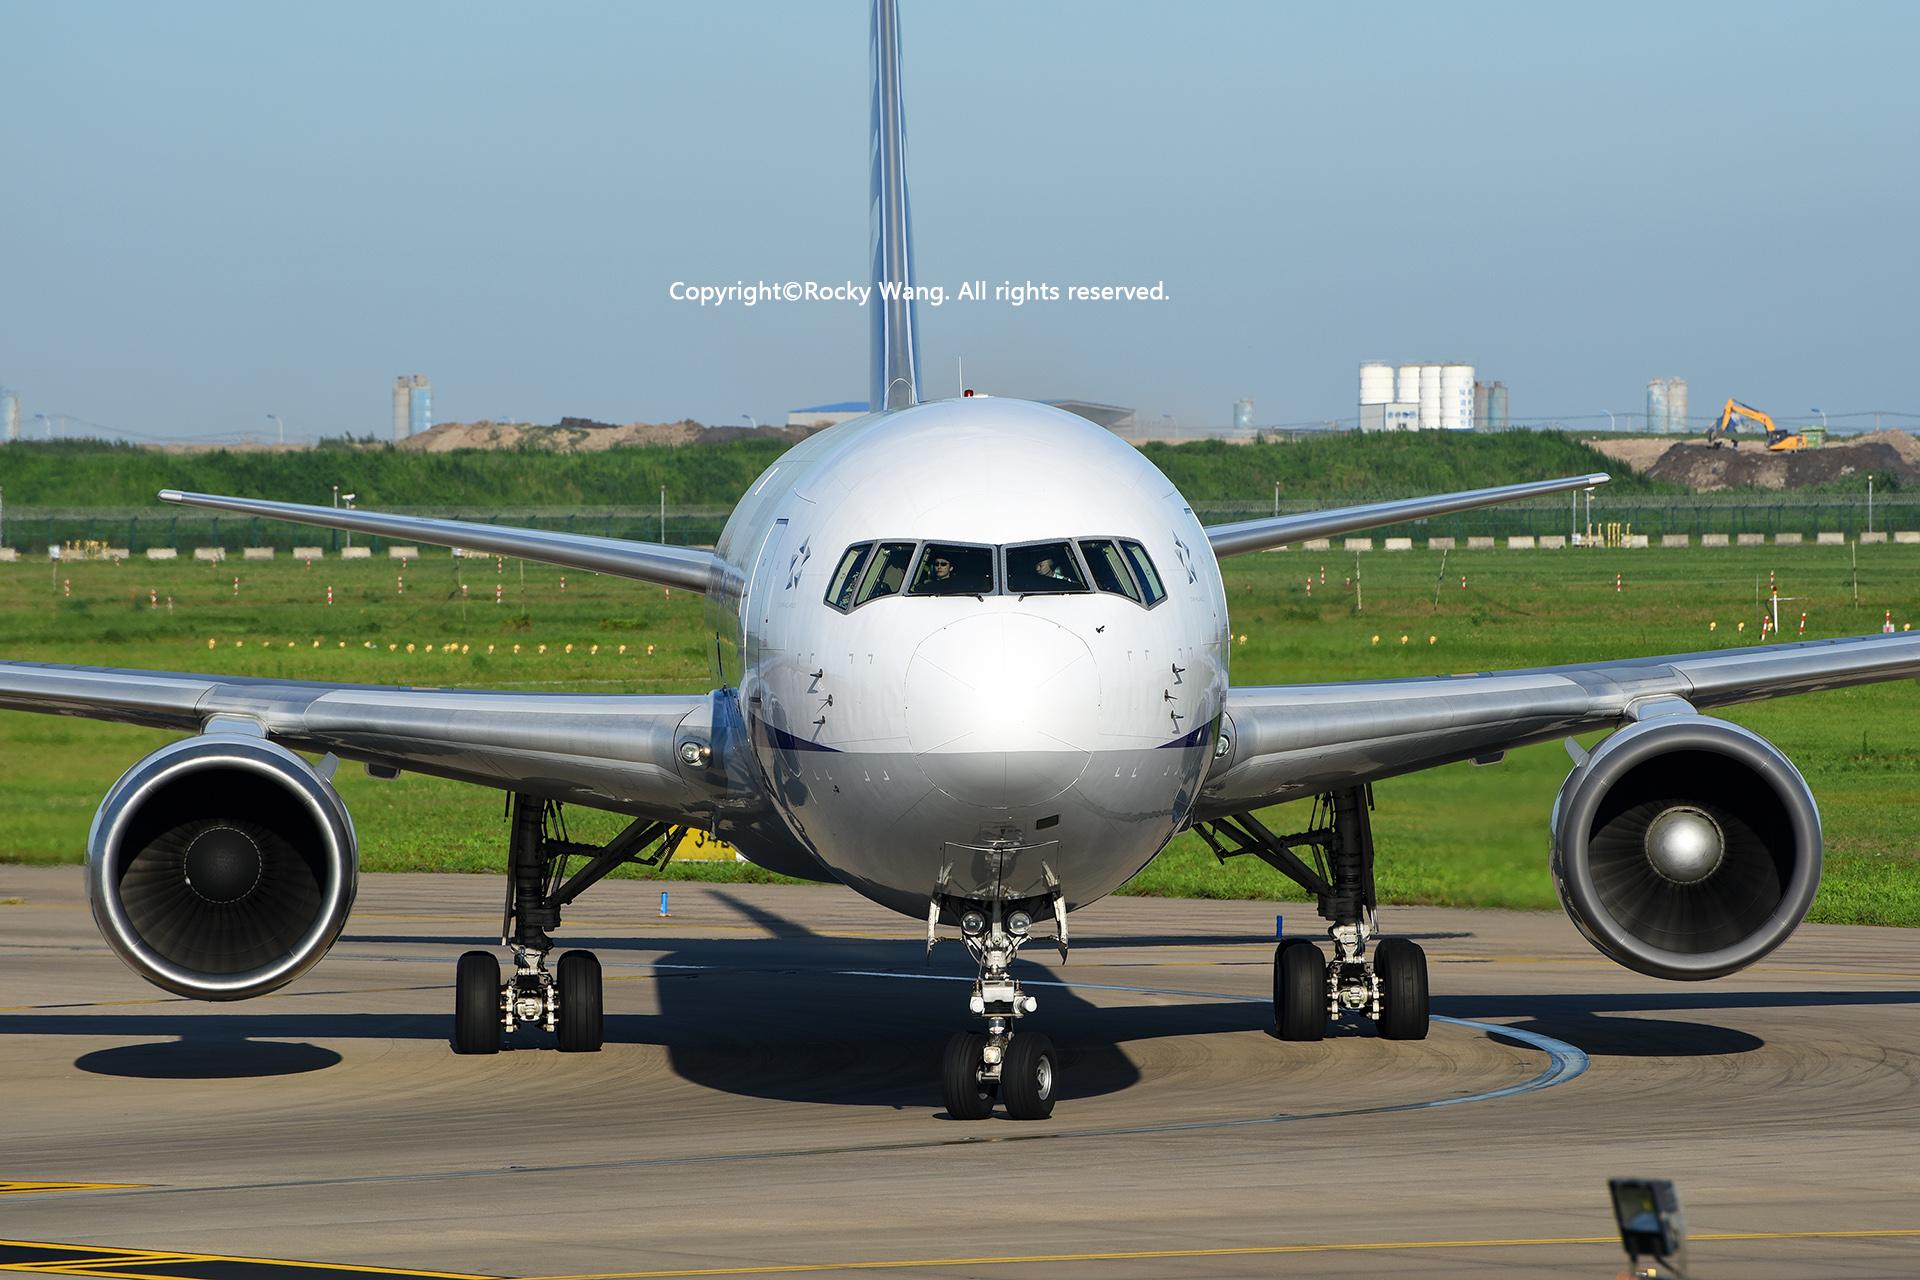 Re:[原创]盗图就别狂 发组表情自己体会 BOEING 767-381(ER) JA611A Shanghai Pudong